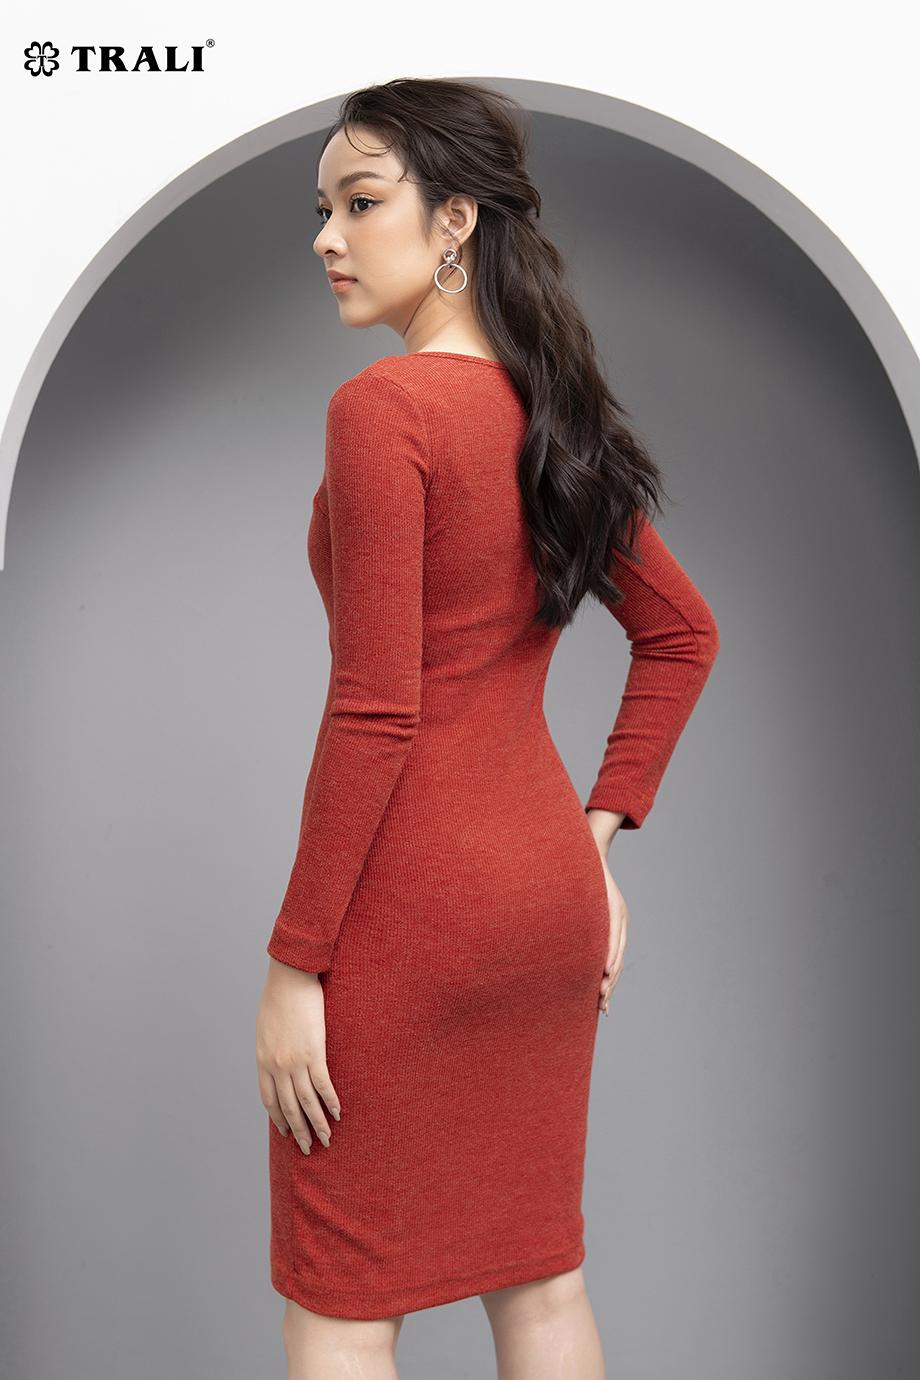 Đầm len 26021 đỏ